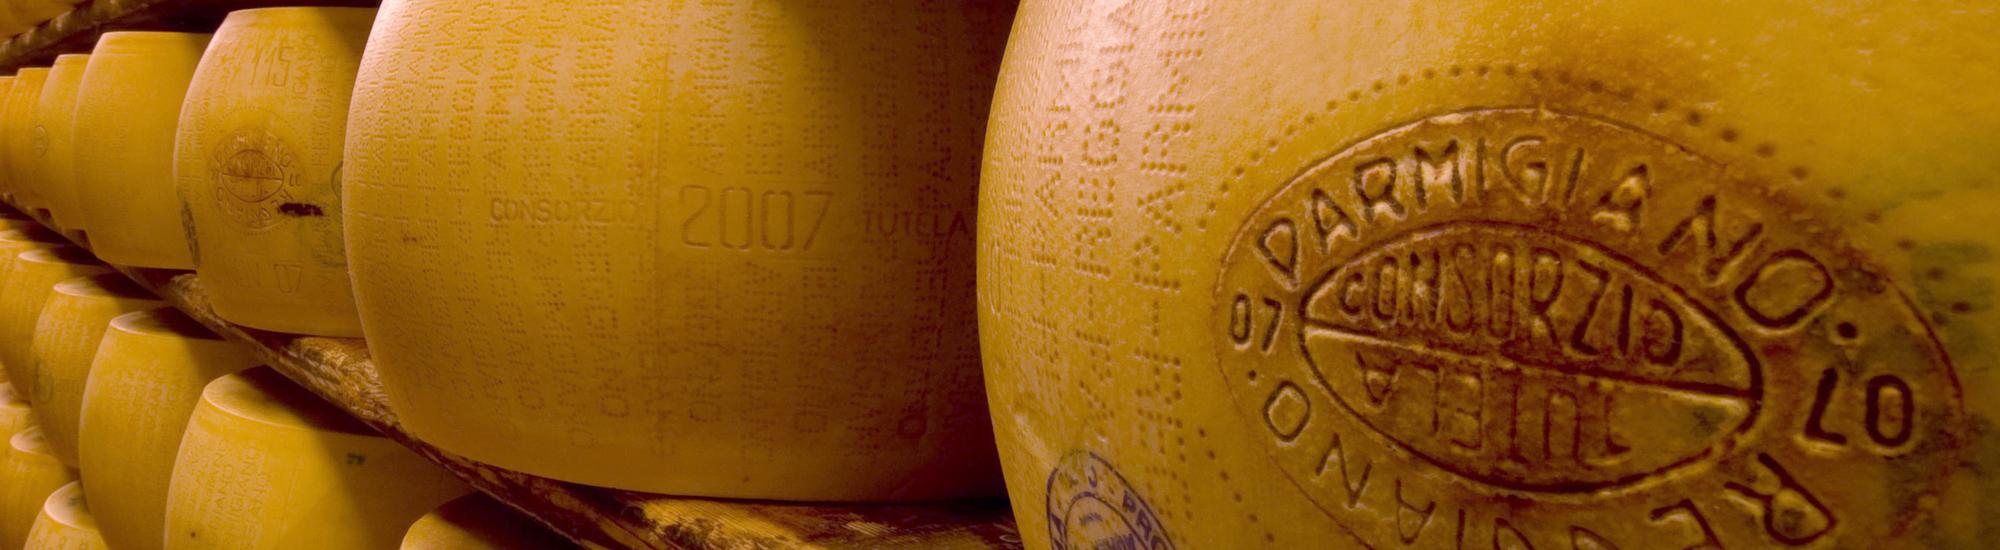 Stacks on stacks of Parmigiano Reggiano wheels